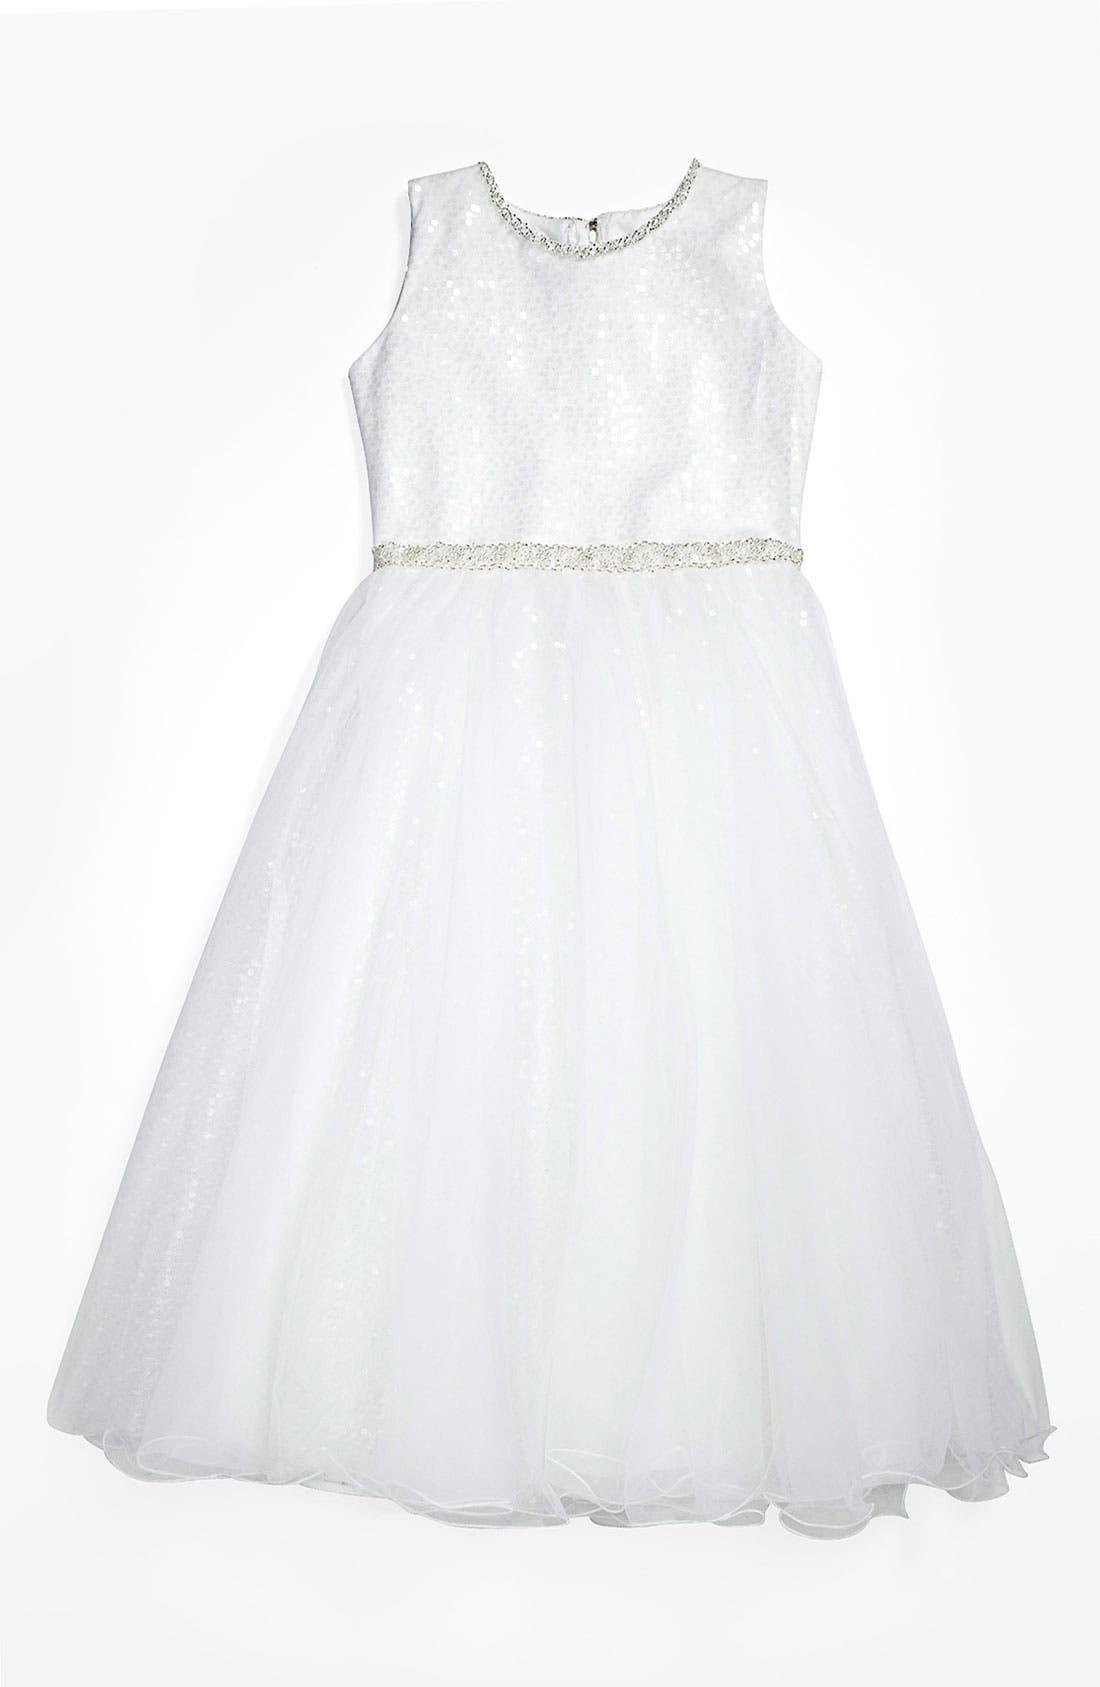 Main Image - Joan Calabrese for Mon Cheri Tulle Dress (Big Girls)